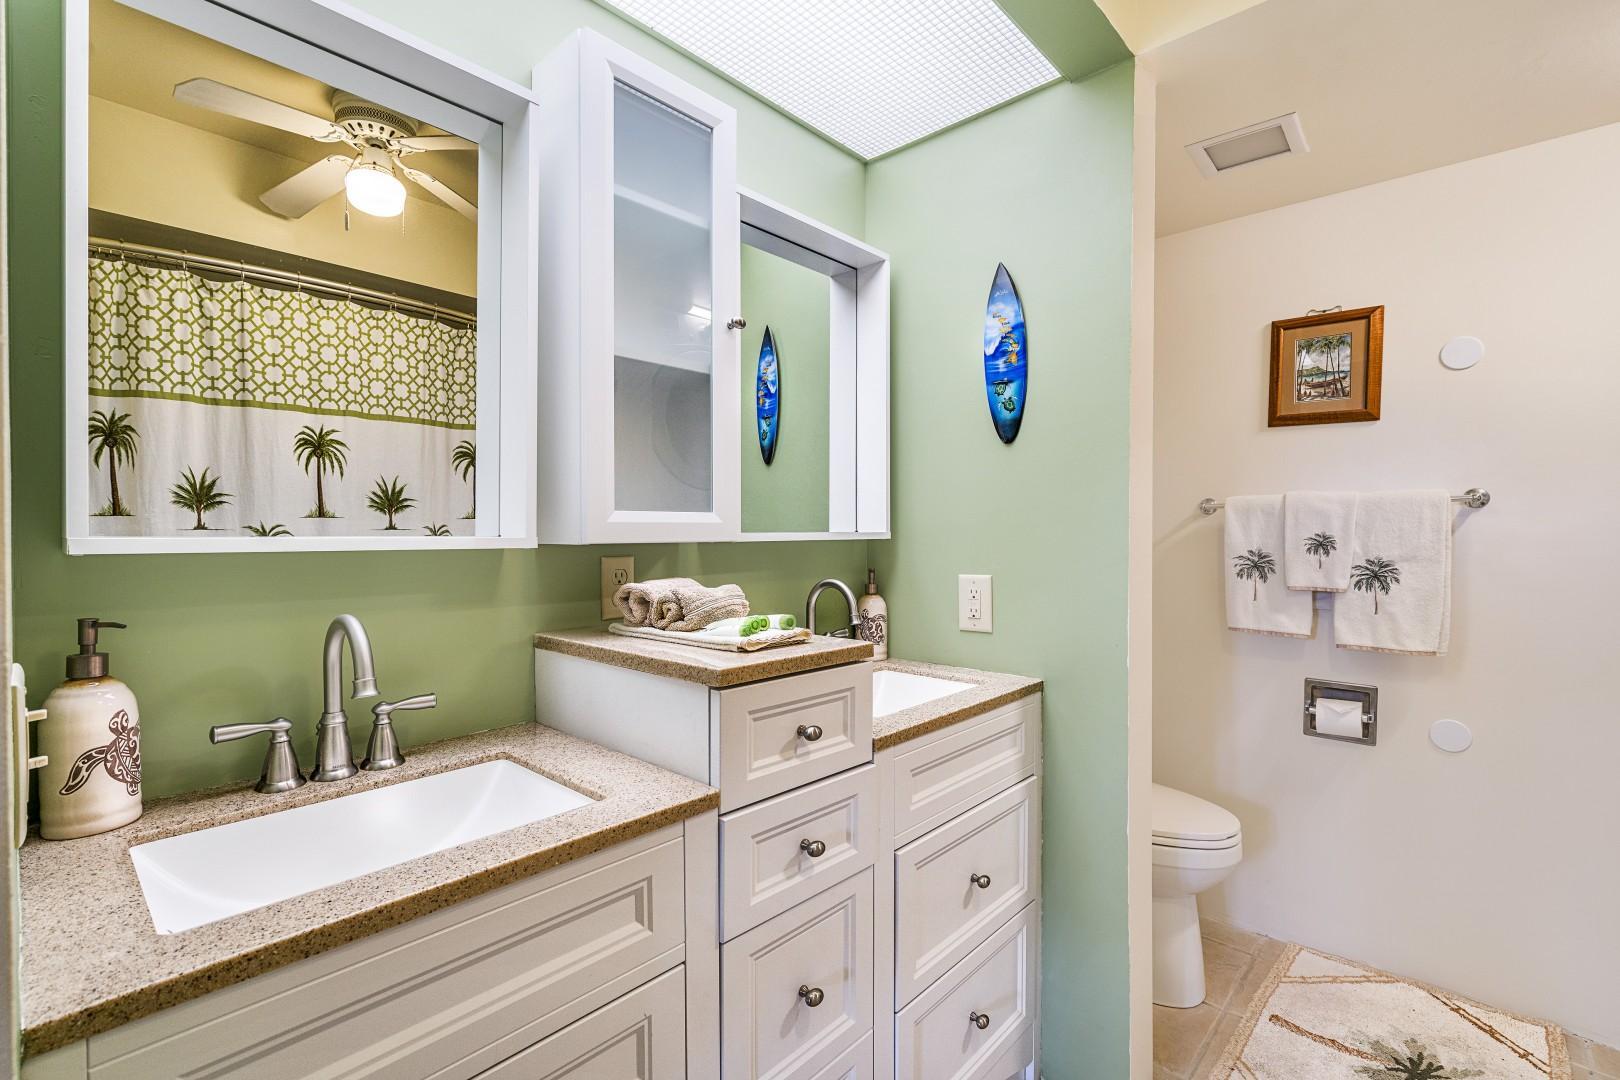 Upgraded bathroom with dual vanities